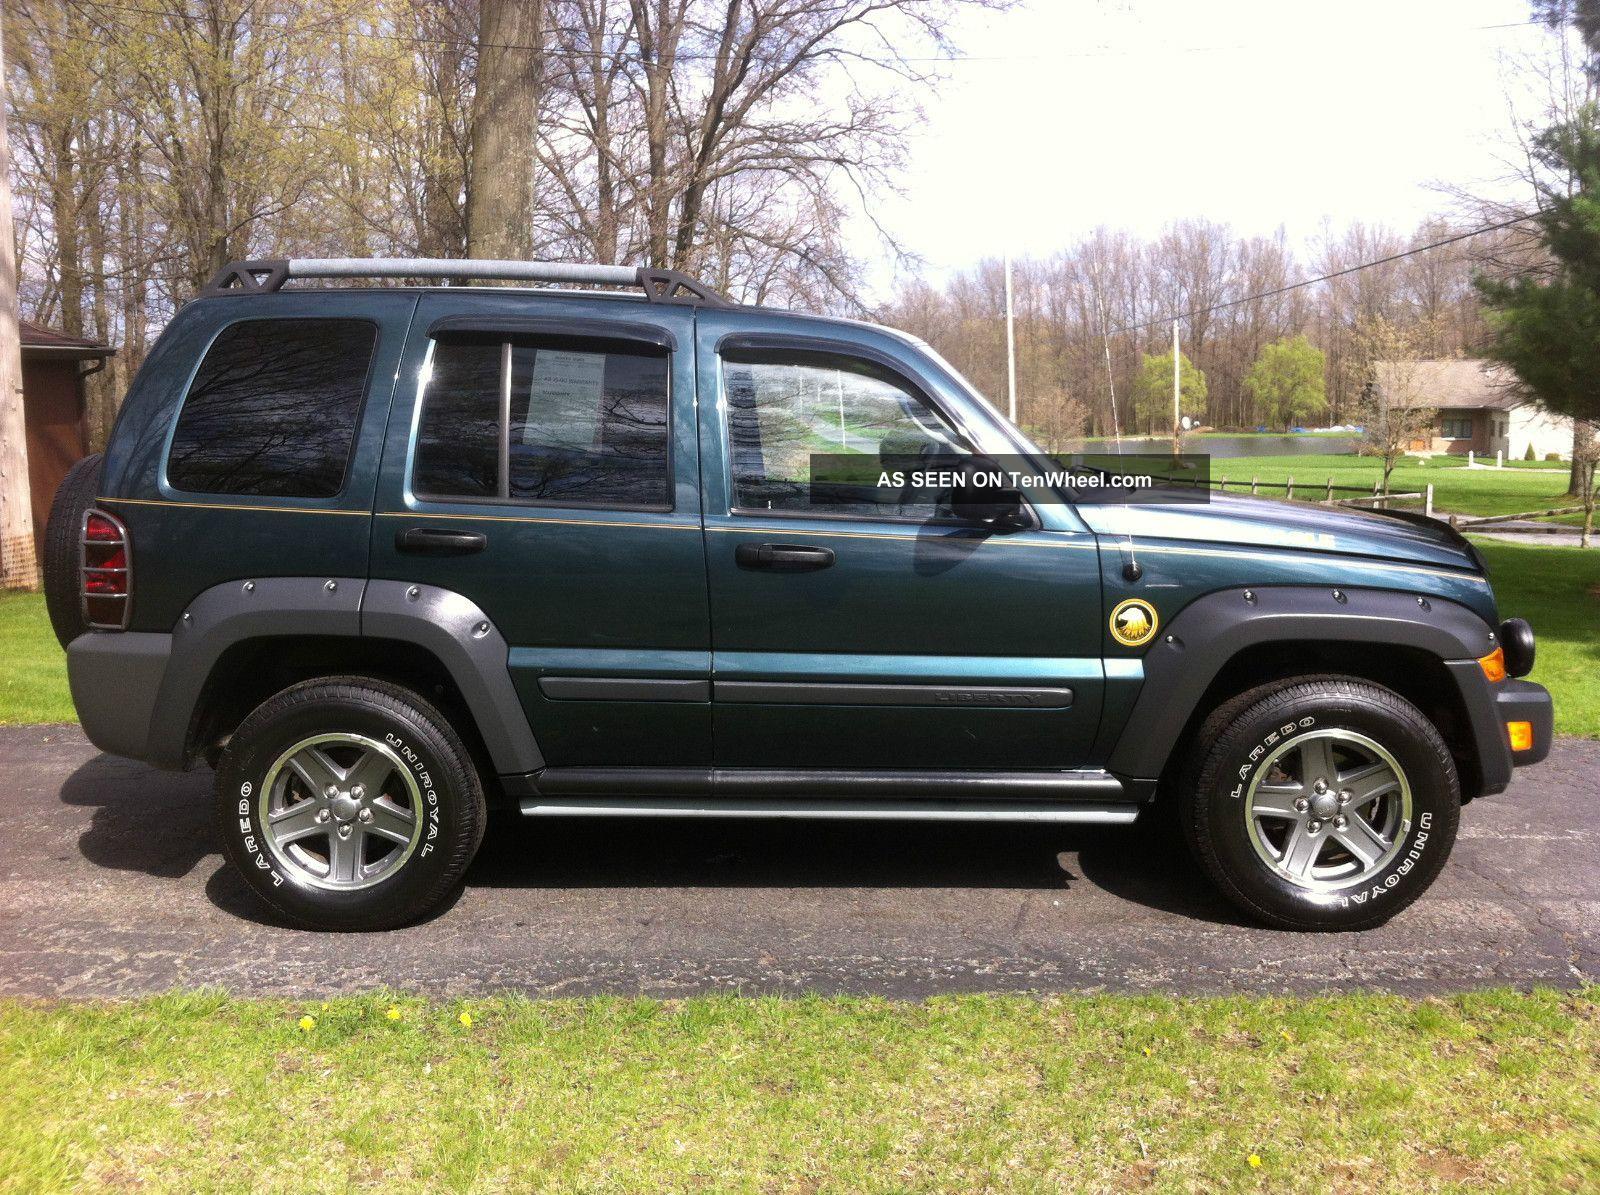 2005 jeep liberty renegade sport utility 4 door 3 7l. Black Bedroom Furniture Sets. Home Design Ideas